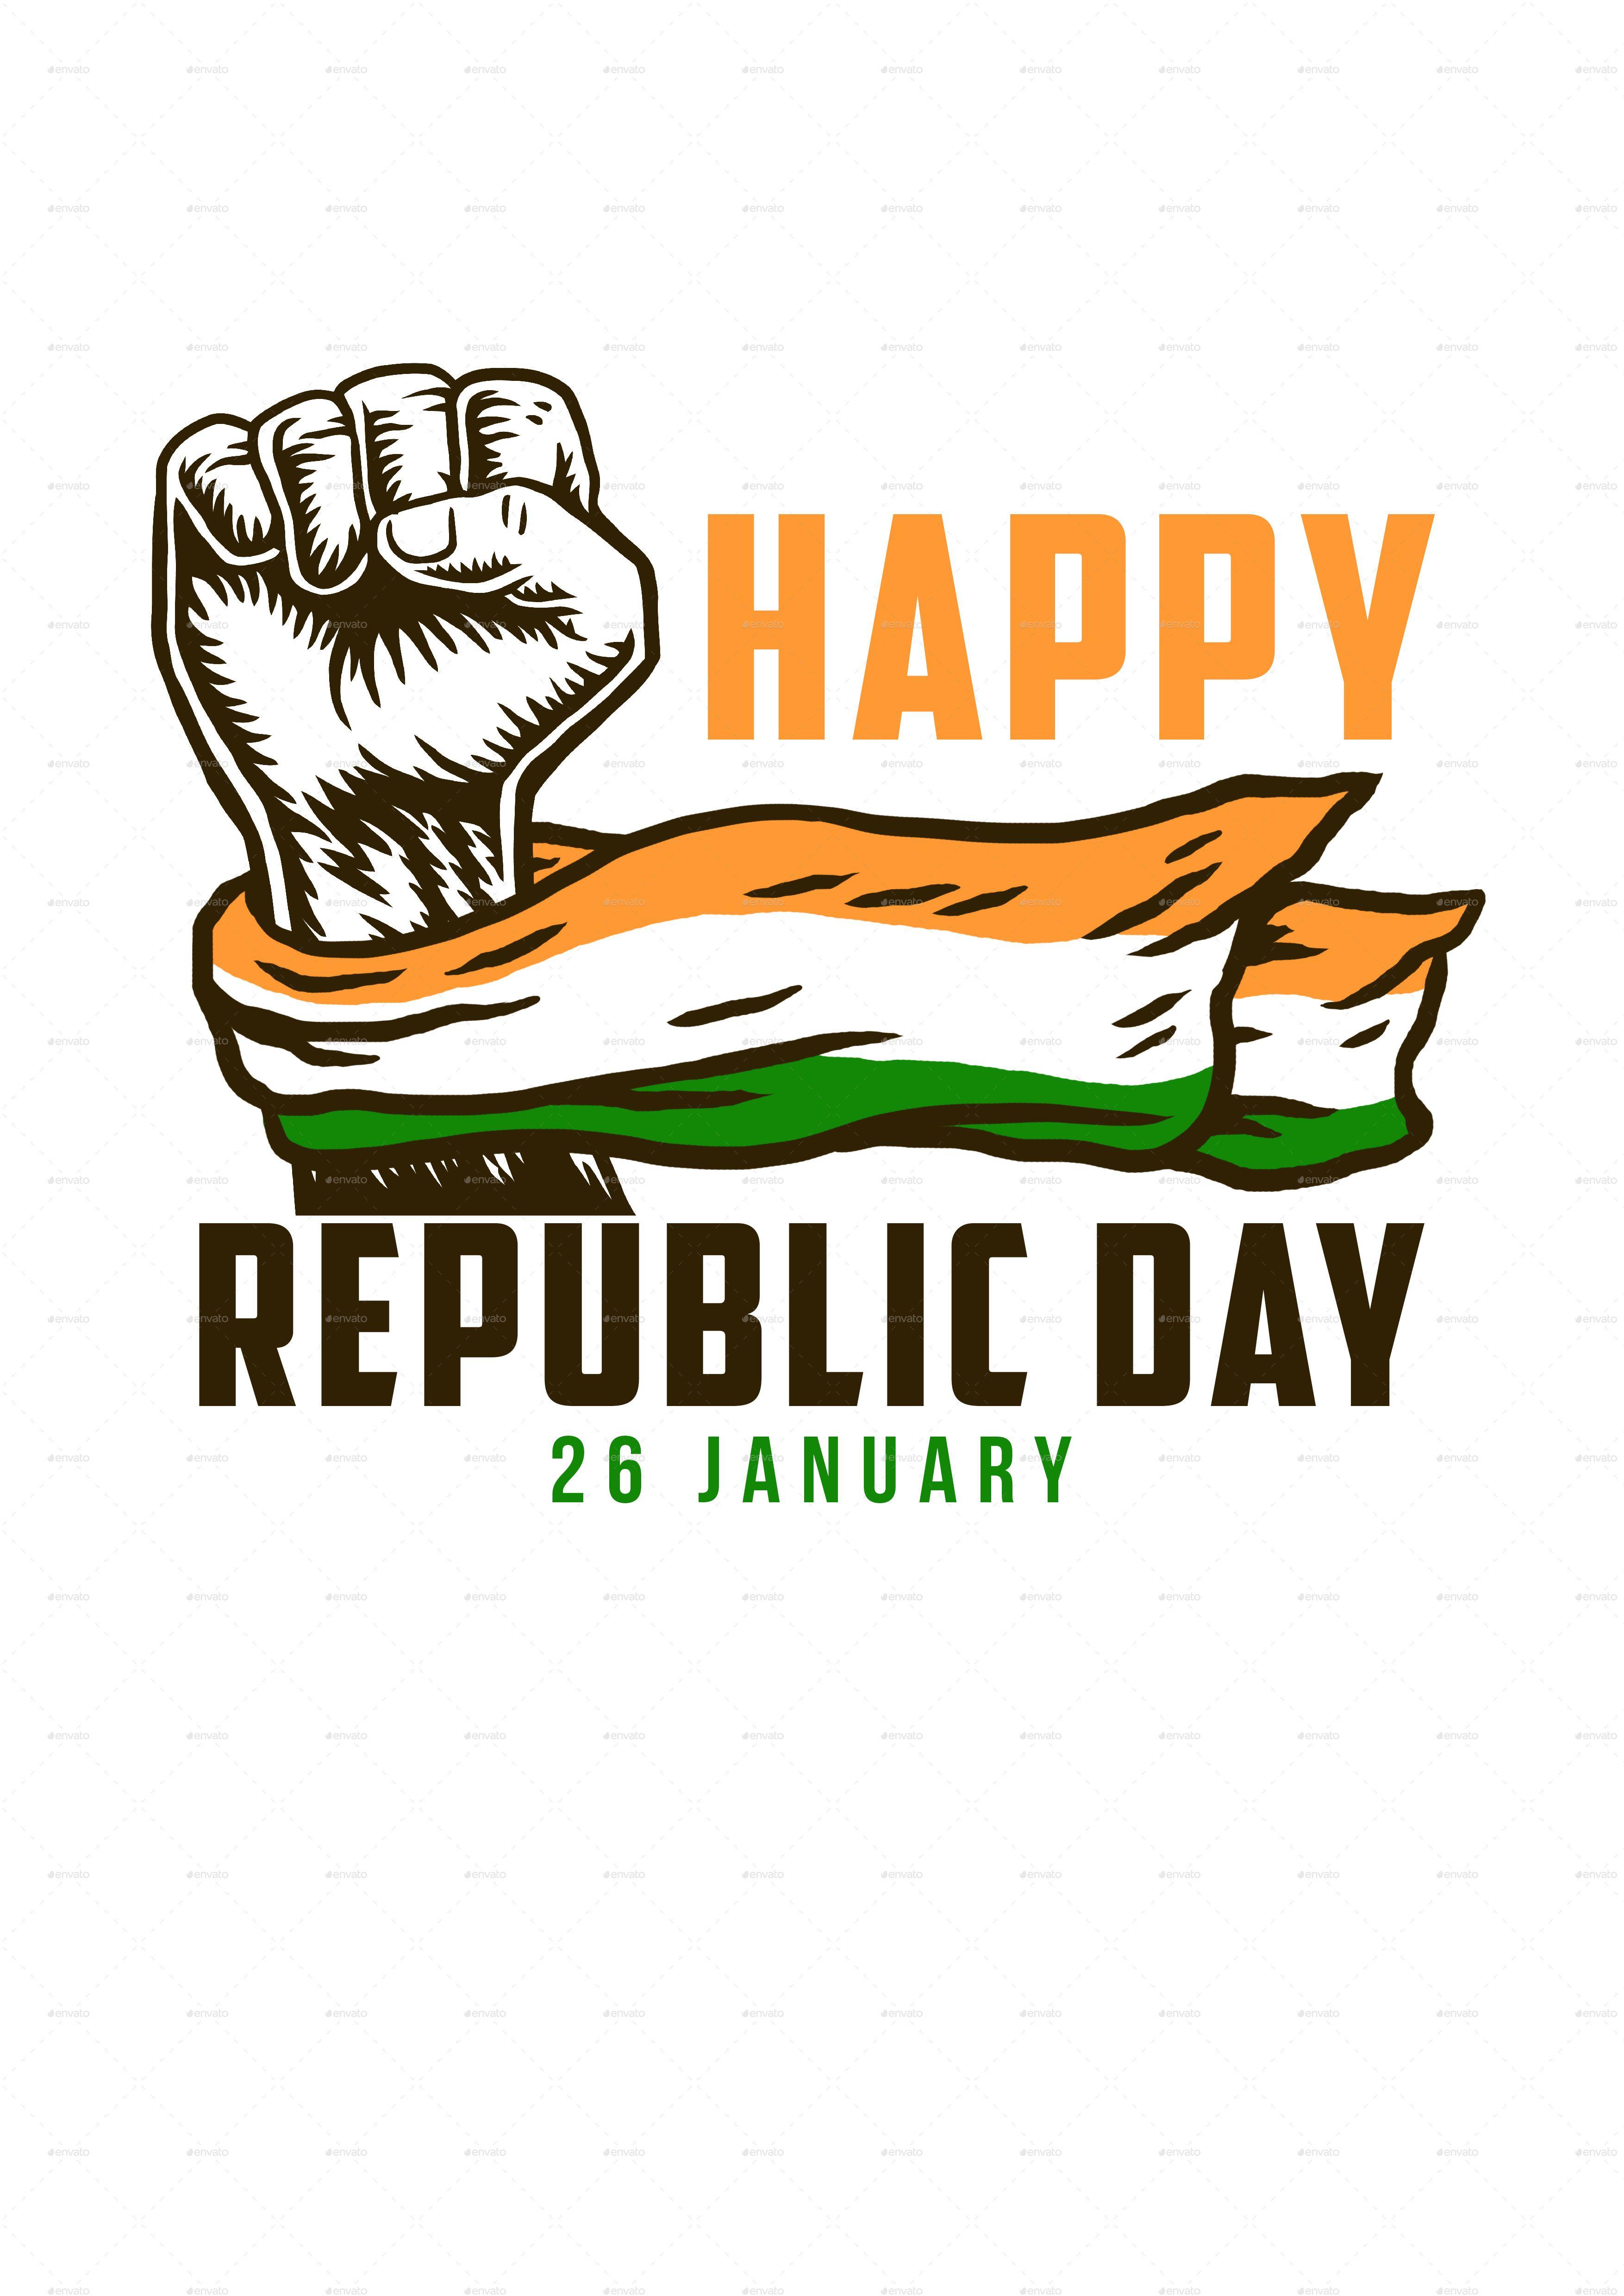 Happy India Republic Day Preview Graphicriver In 2021 Republic Day India Republic Day Photos Republic Day